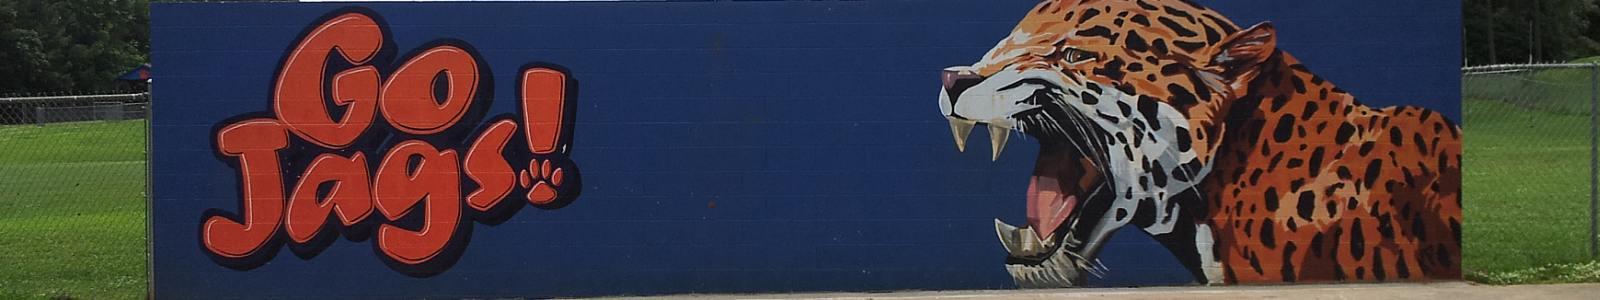 jag club wall.jpg1600